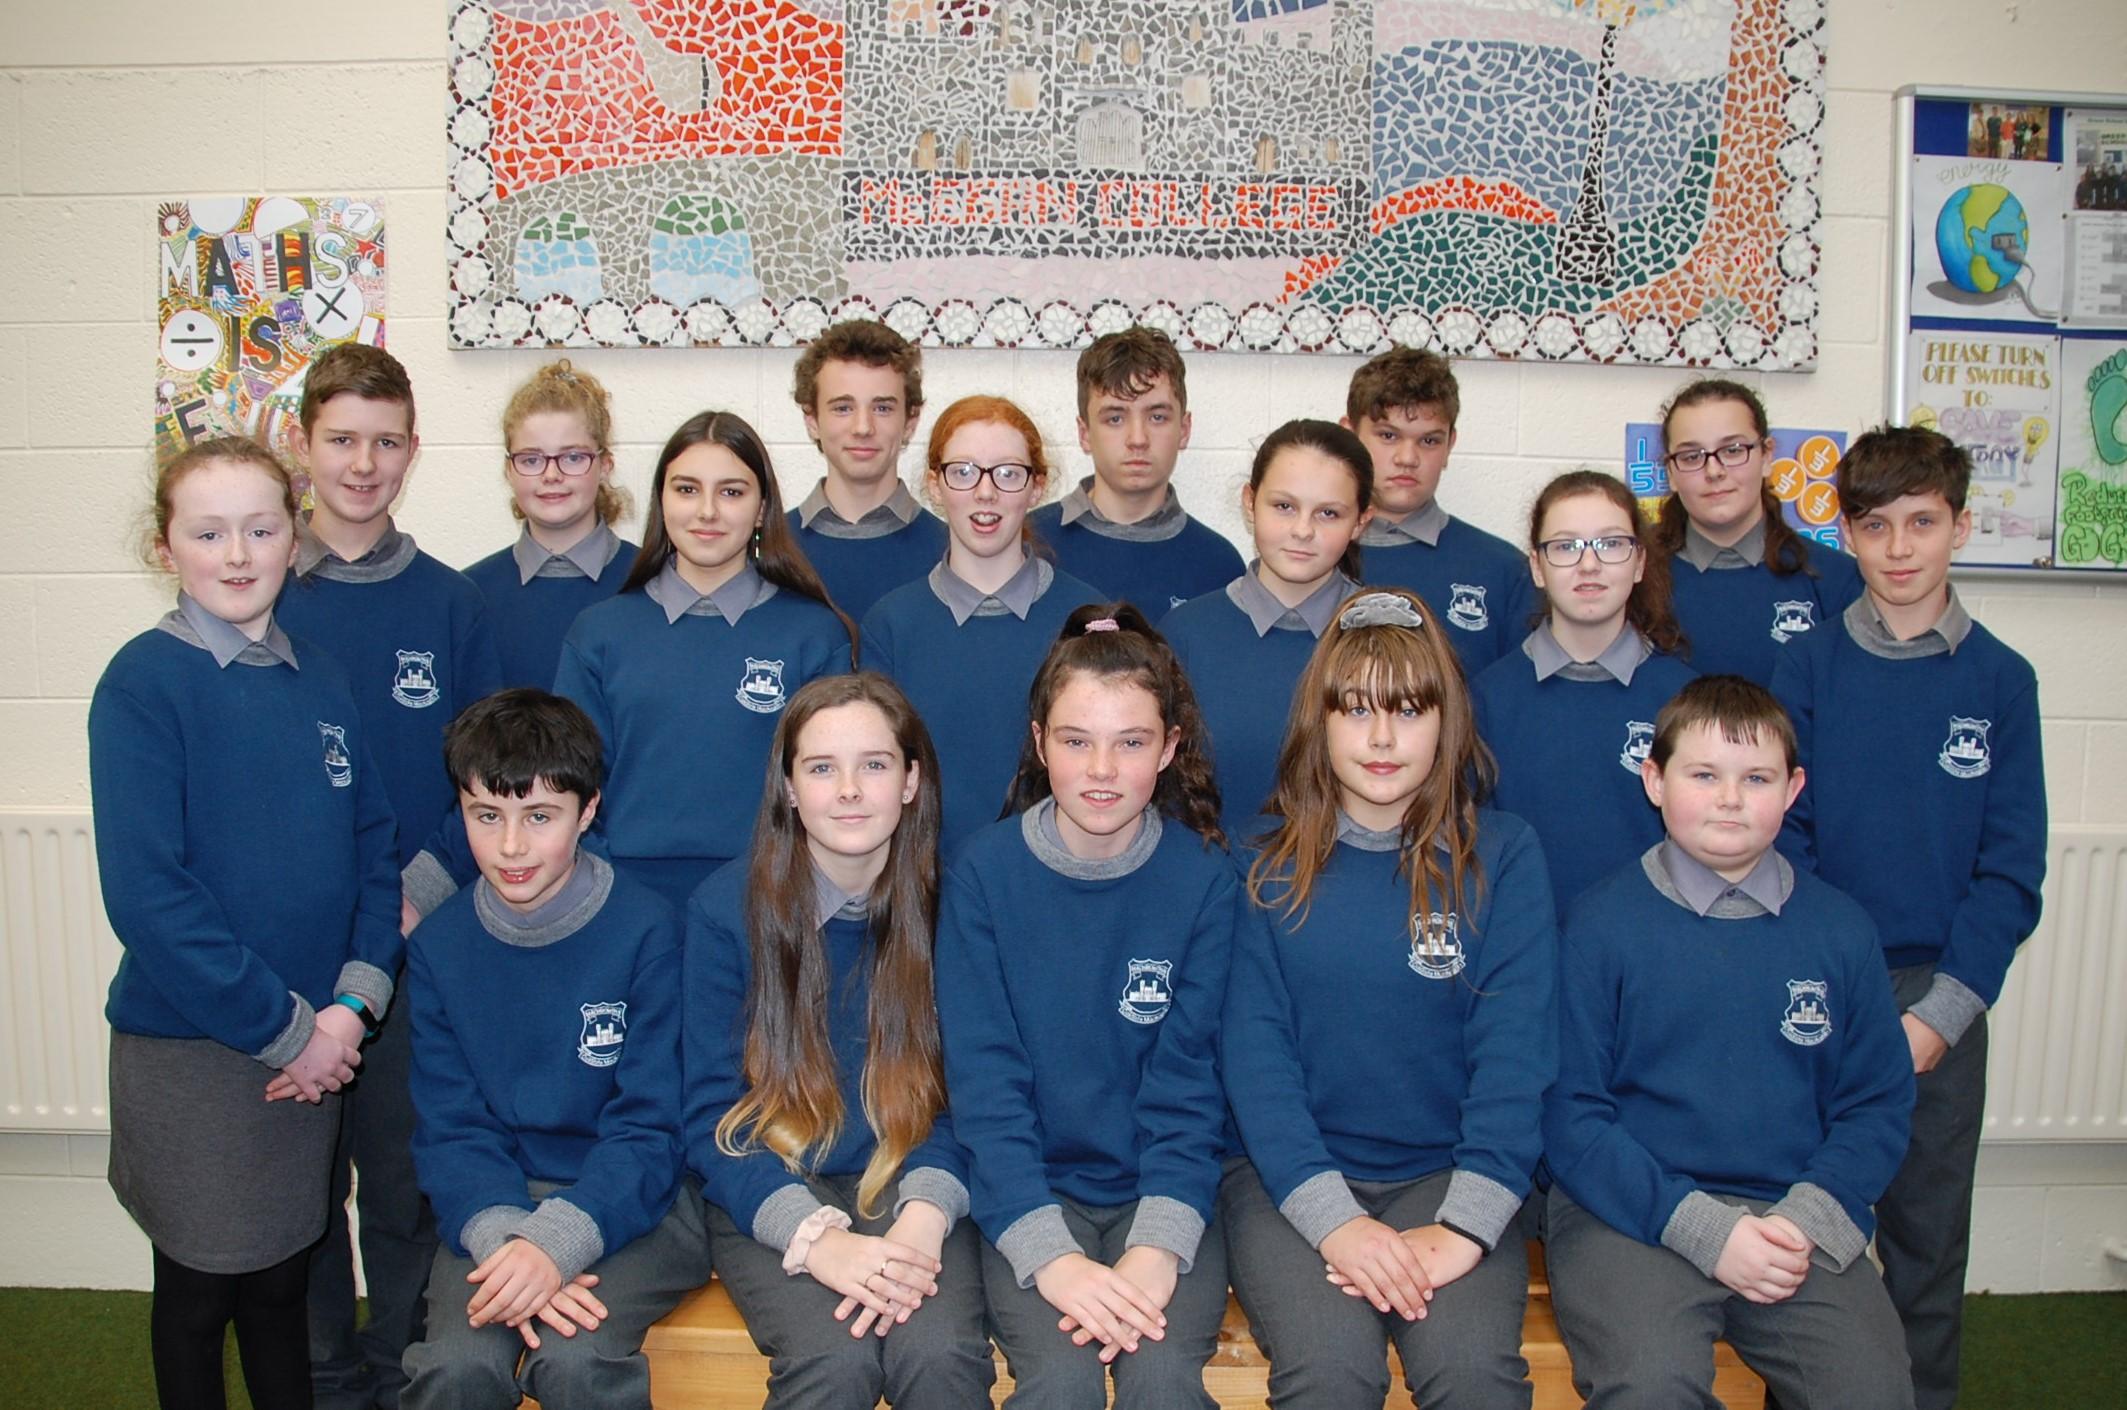 St Marys Secondary School, Macroom, Co. Cork